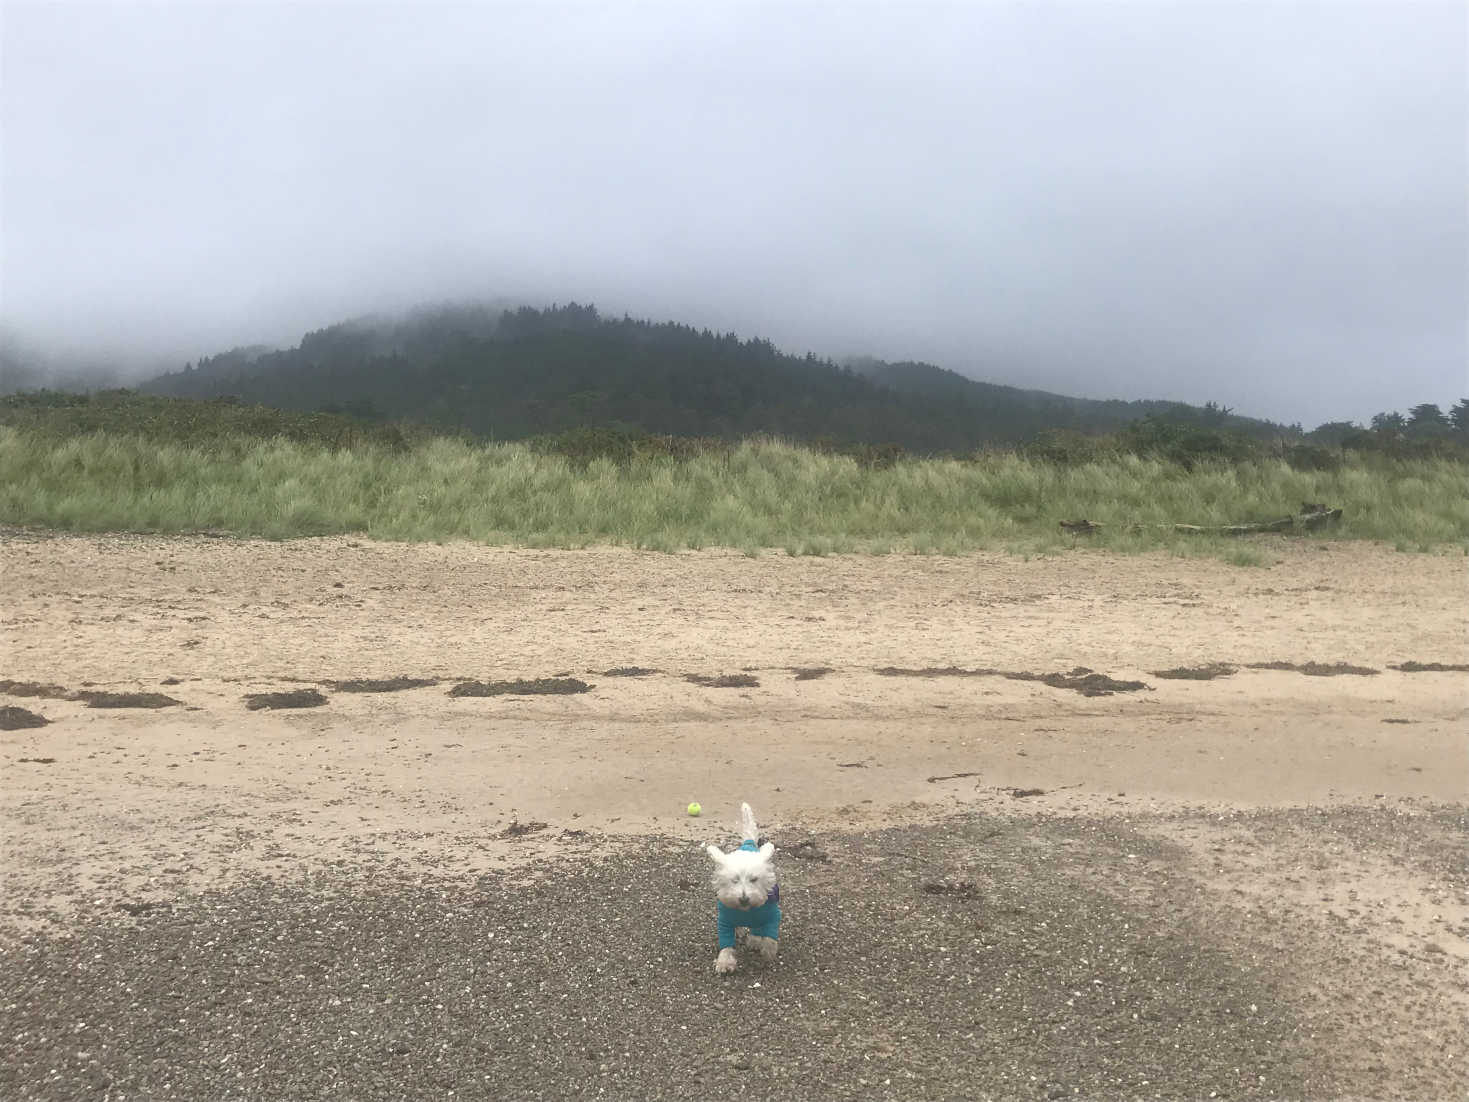 poppysocks on carradale beach in onsy